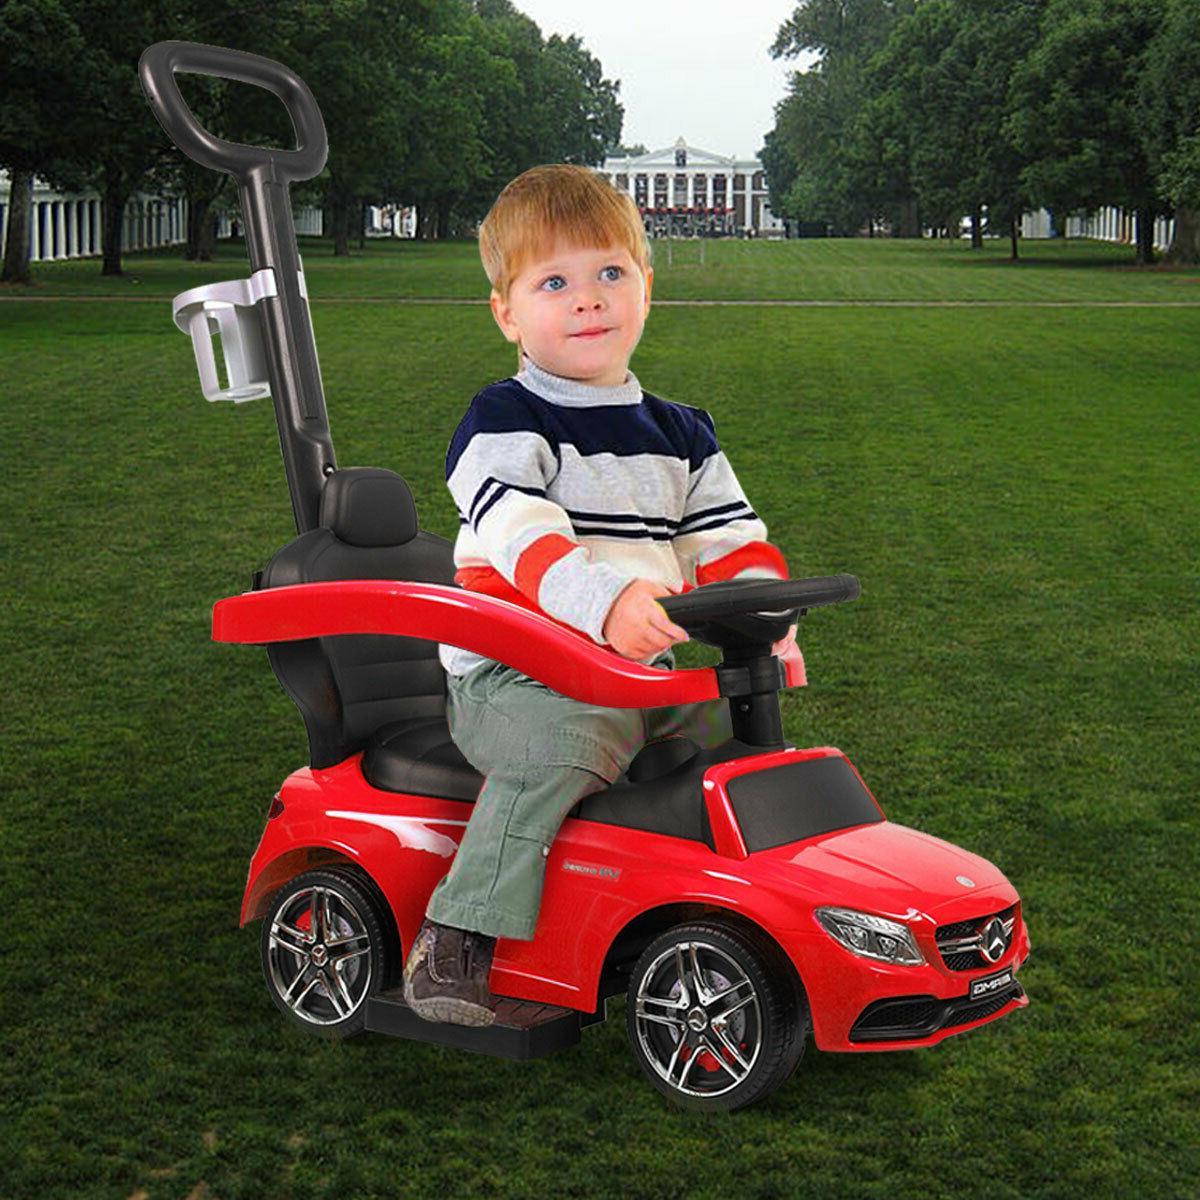 Licensed Ride Push Car Stroller Toddler w/push rod